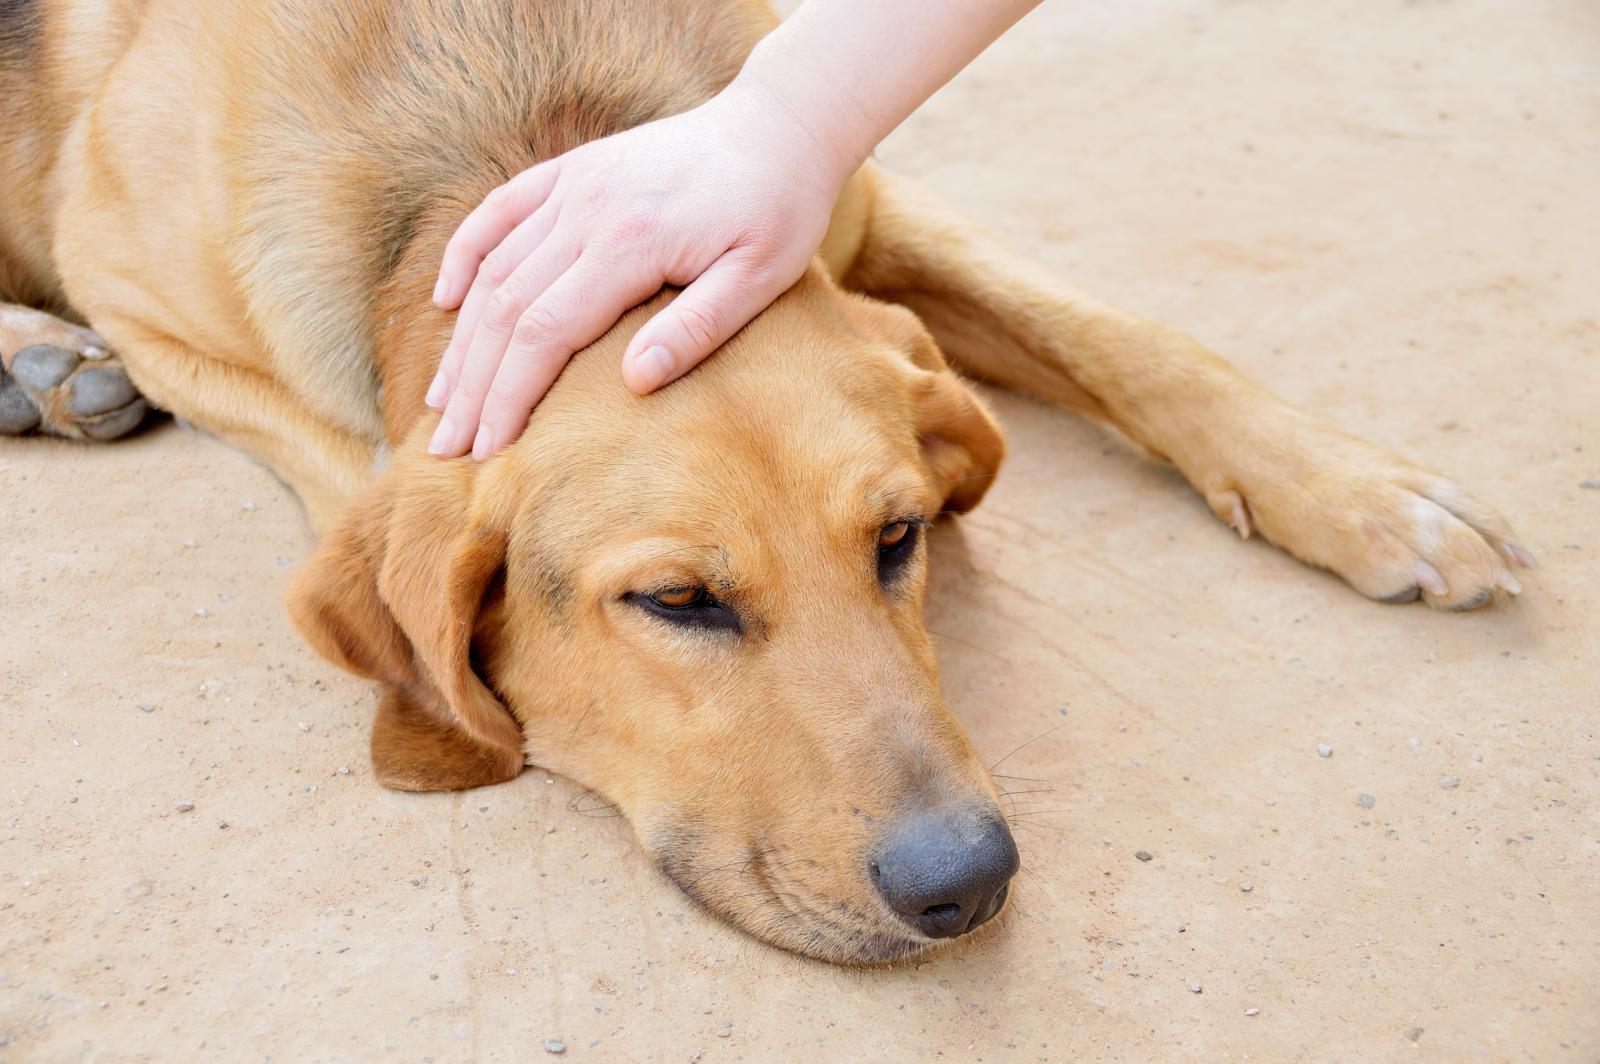 Petting a sick dog